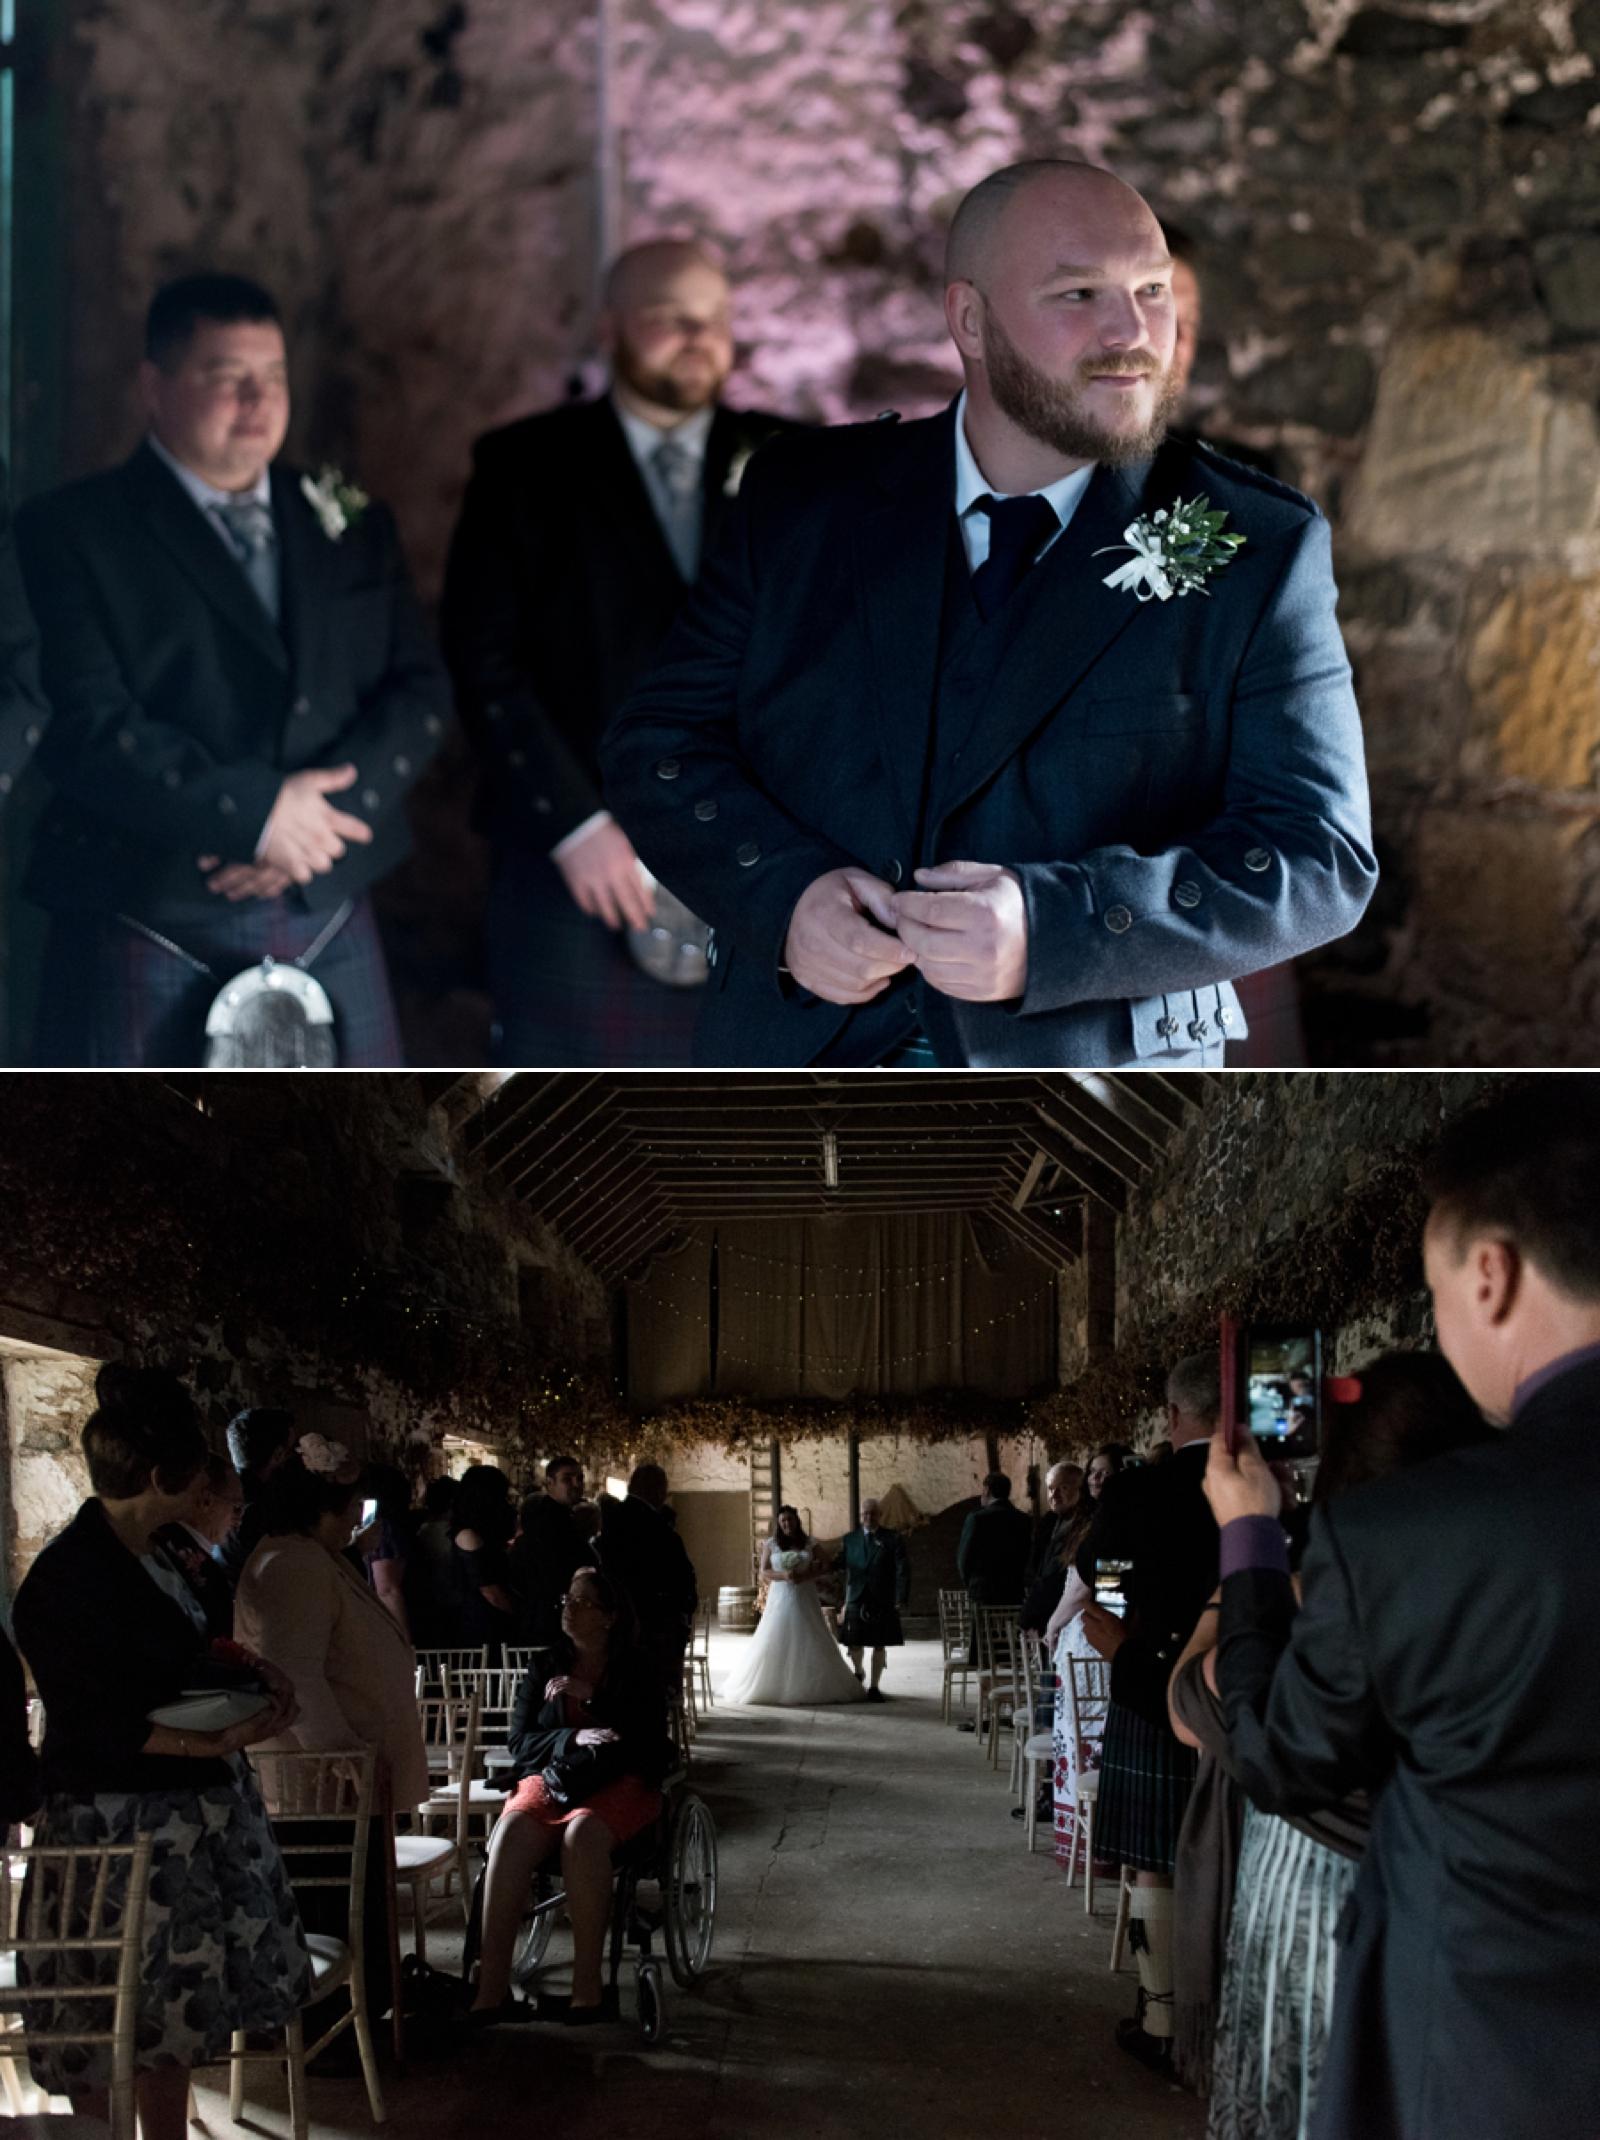 2017-09-23 (Mearns) Pratis Farm Wedding Photography130451.jpg